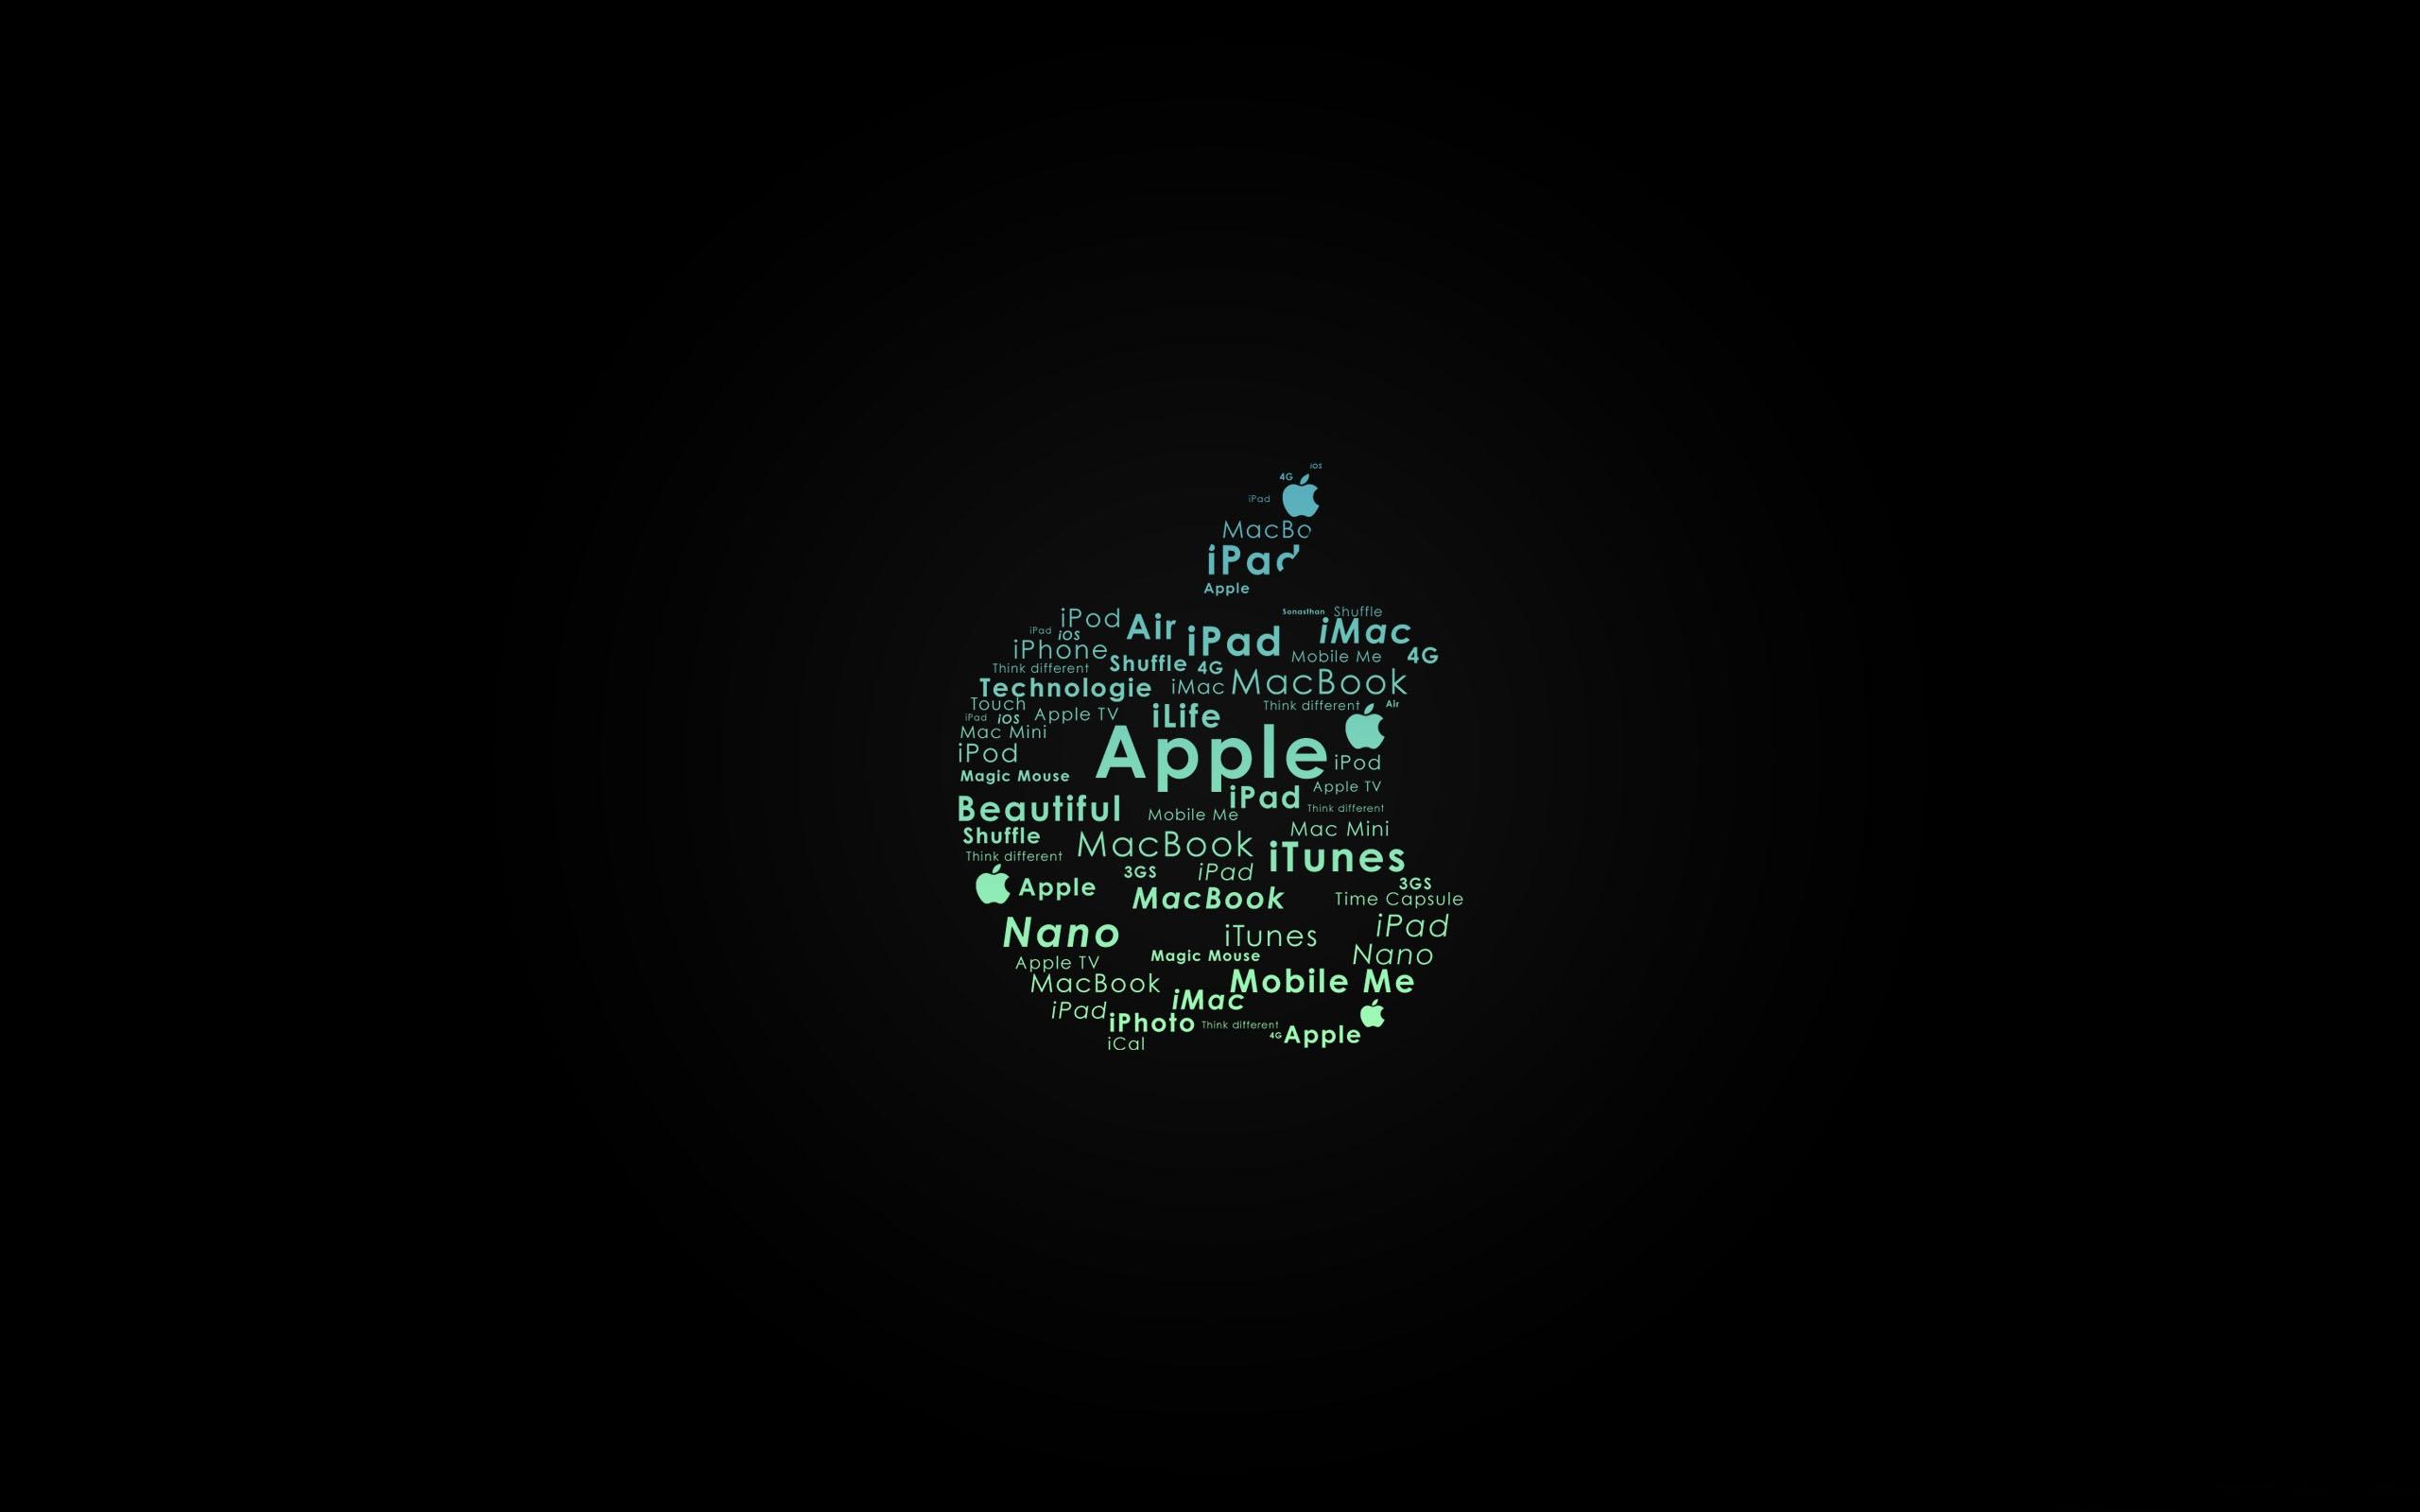 Apple Logo Typography Macbook Air Wallpaper Download Allmacwallpaper